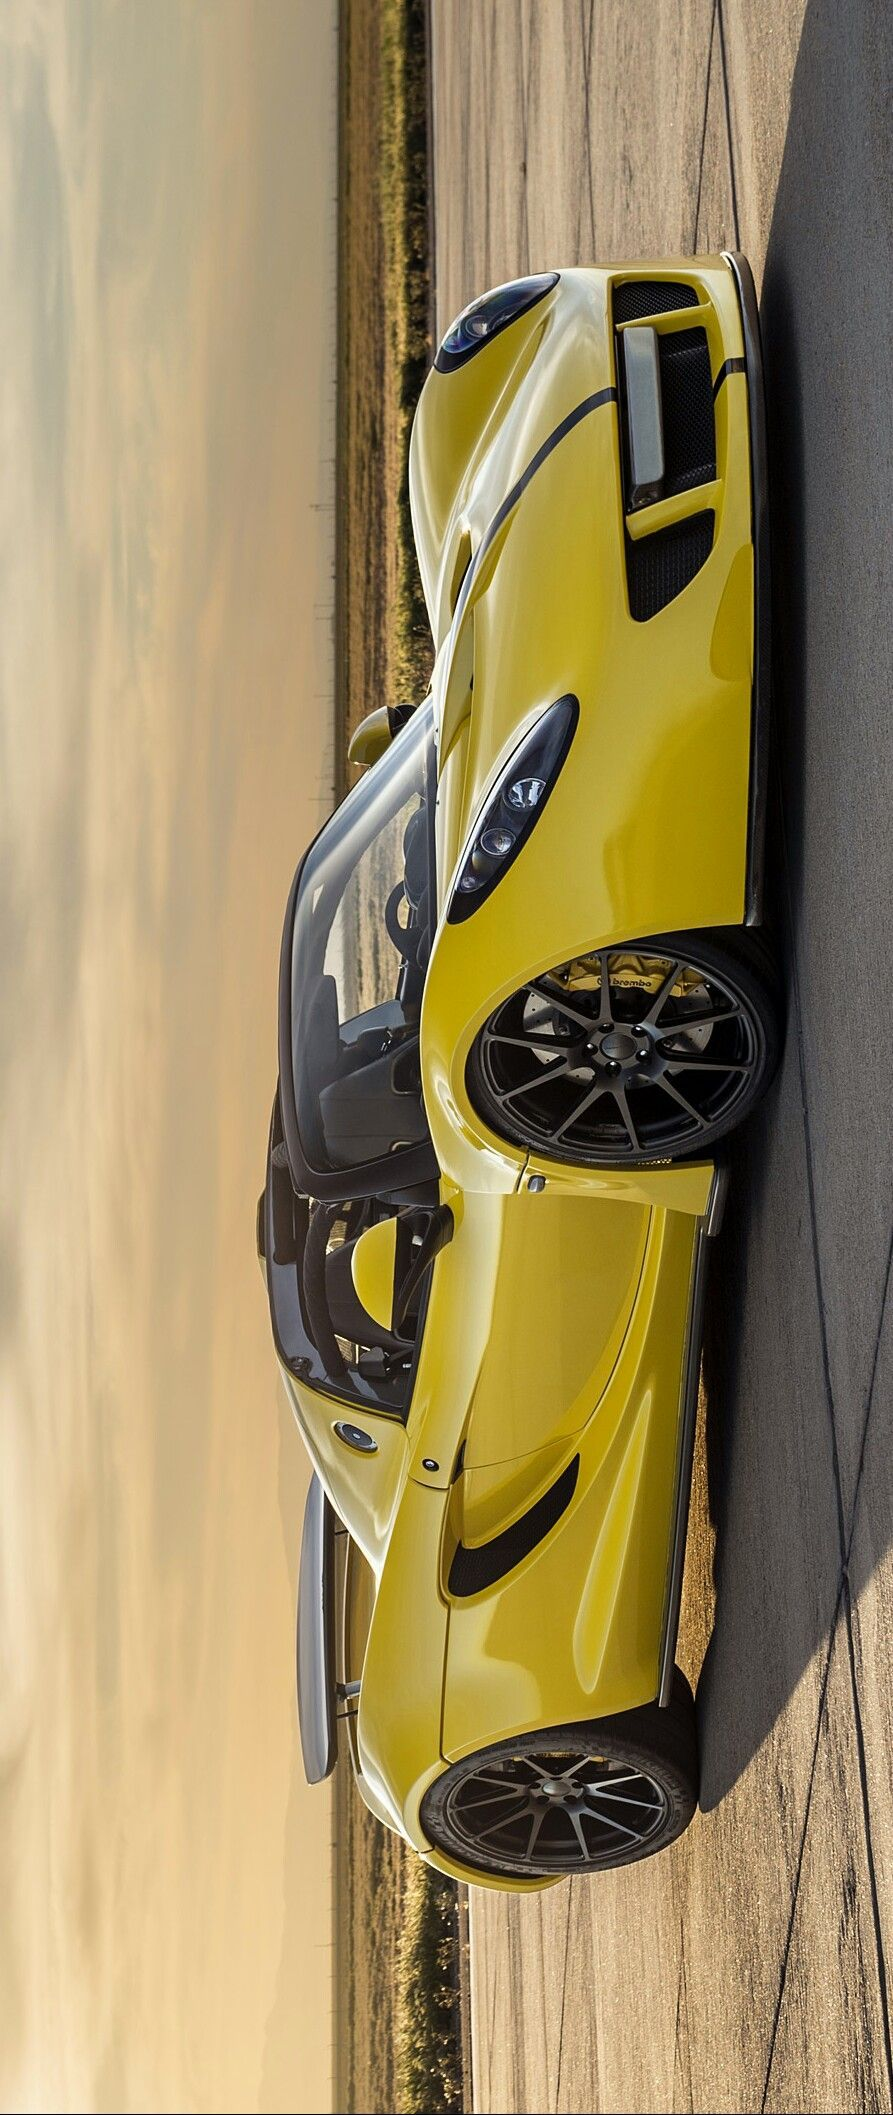 2016 Hennessey Venom GT Spyder #HennesseyVenom